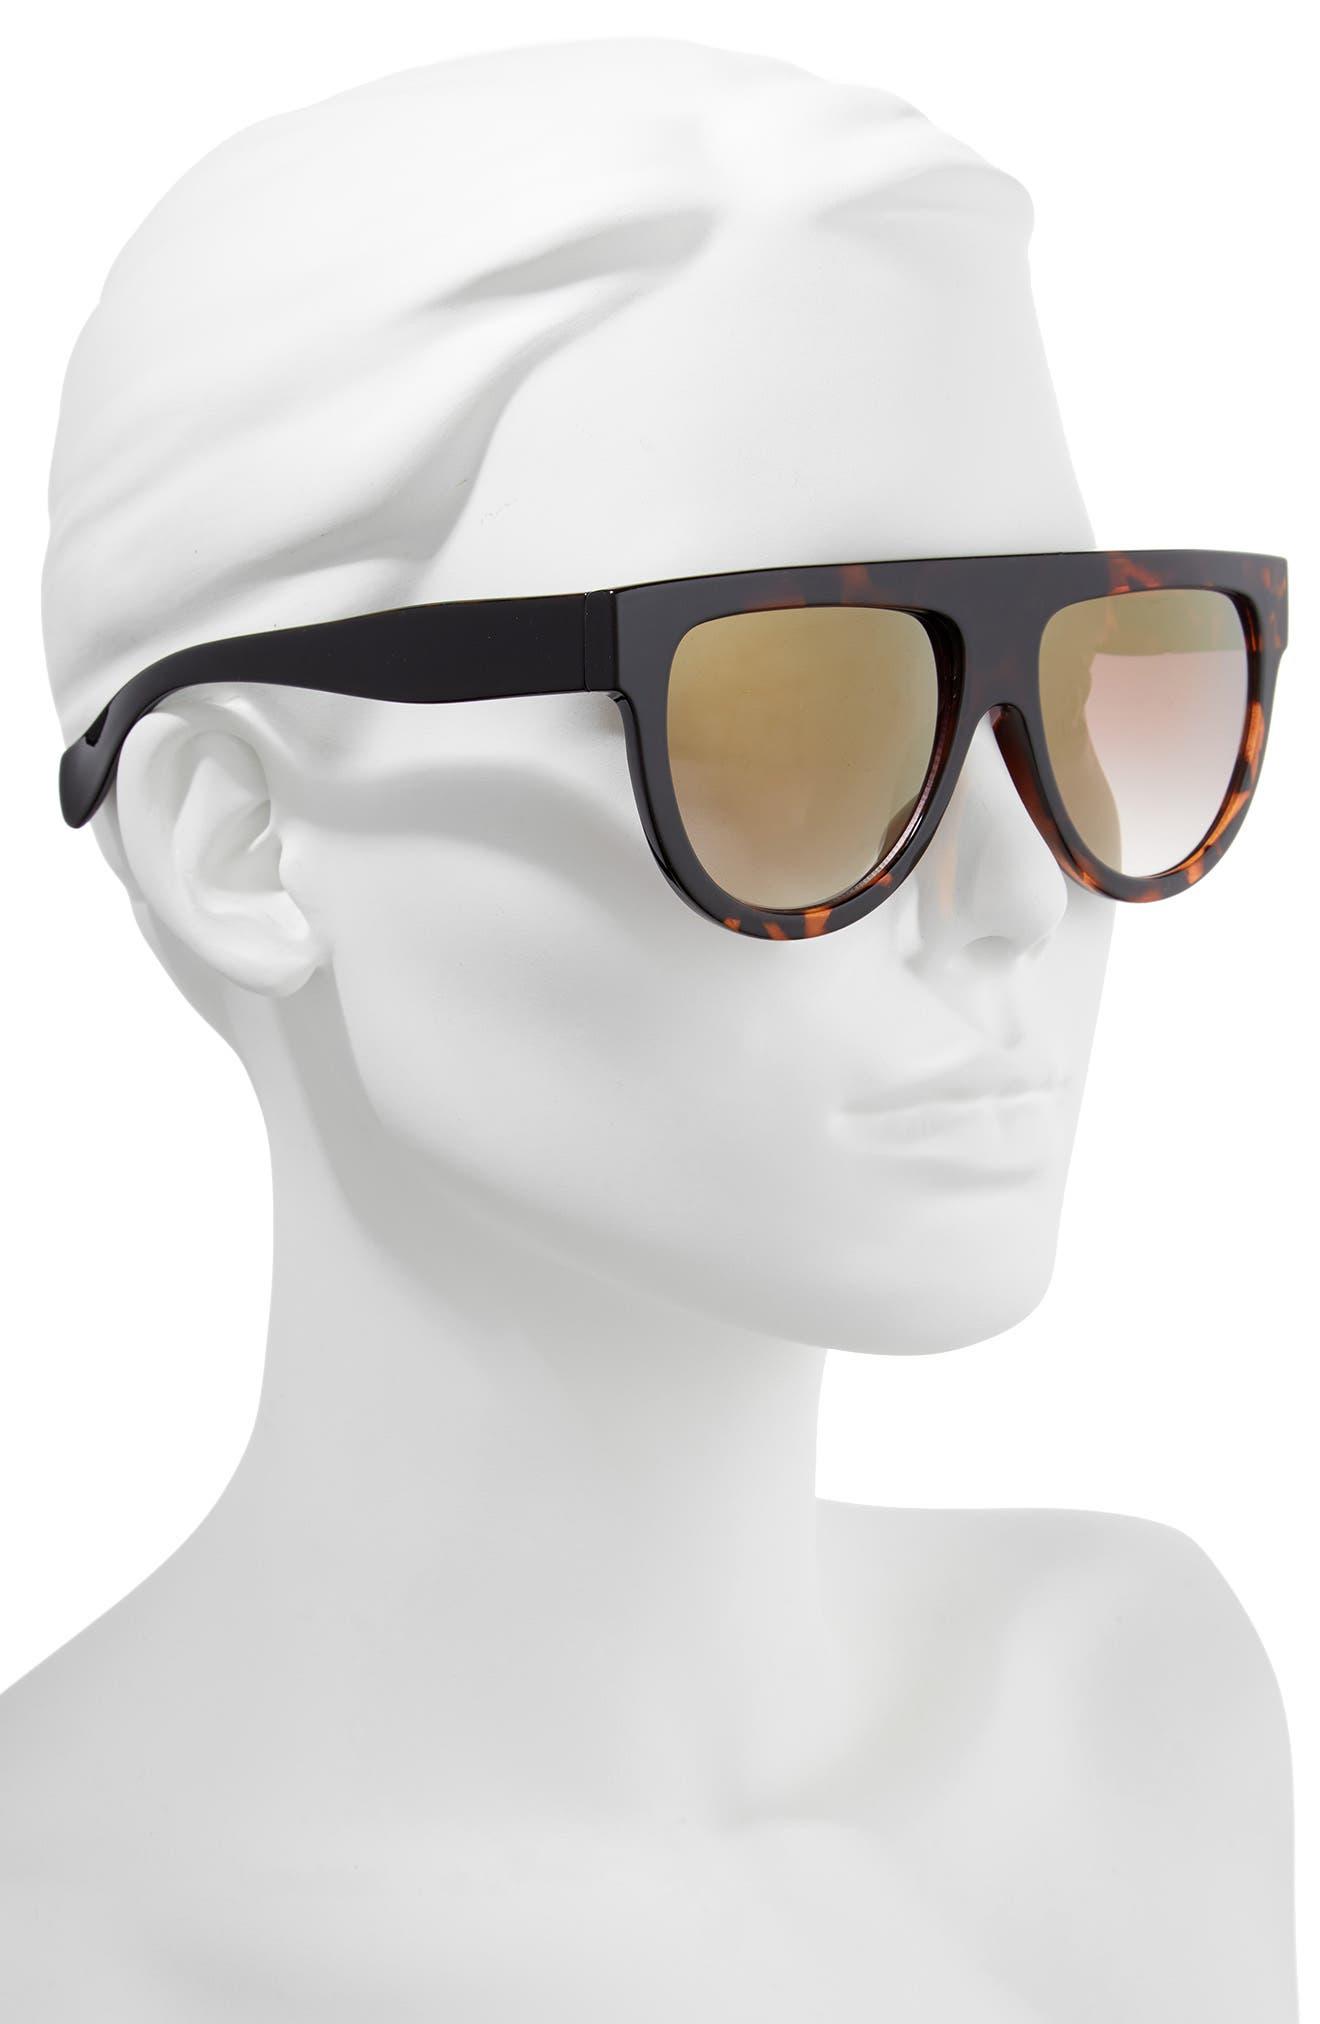 68mm Flat Top Sunglasses,                             Alternate thumbnail 3, color,